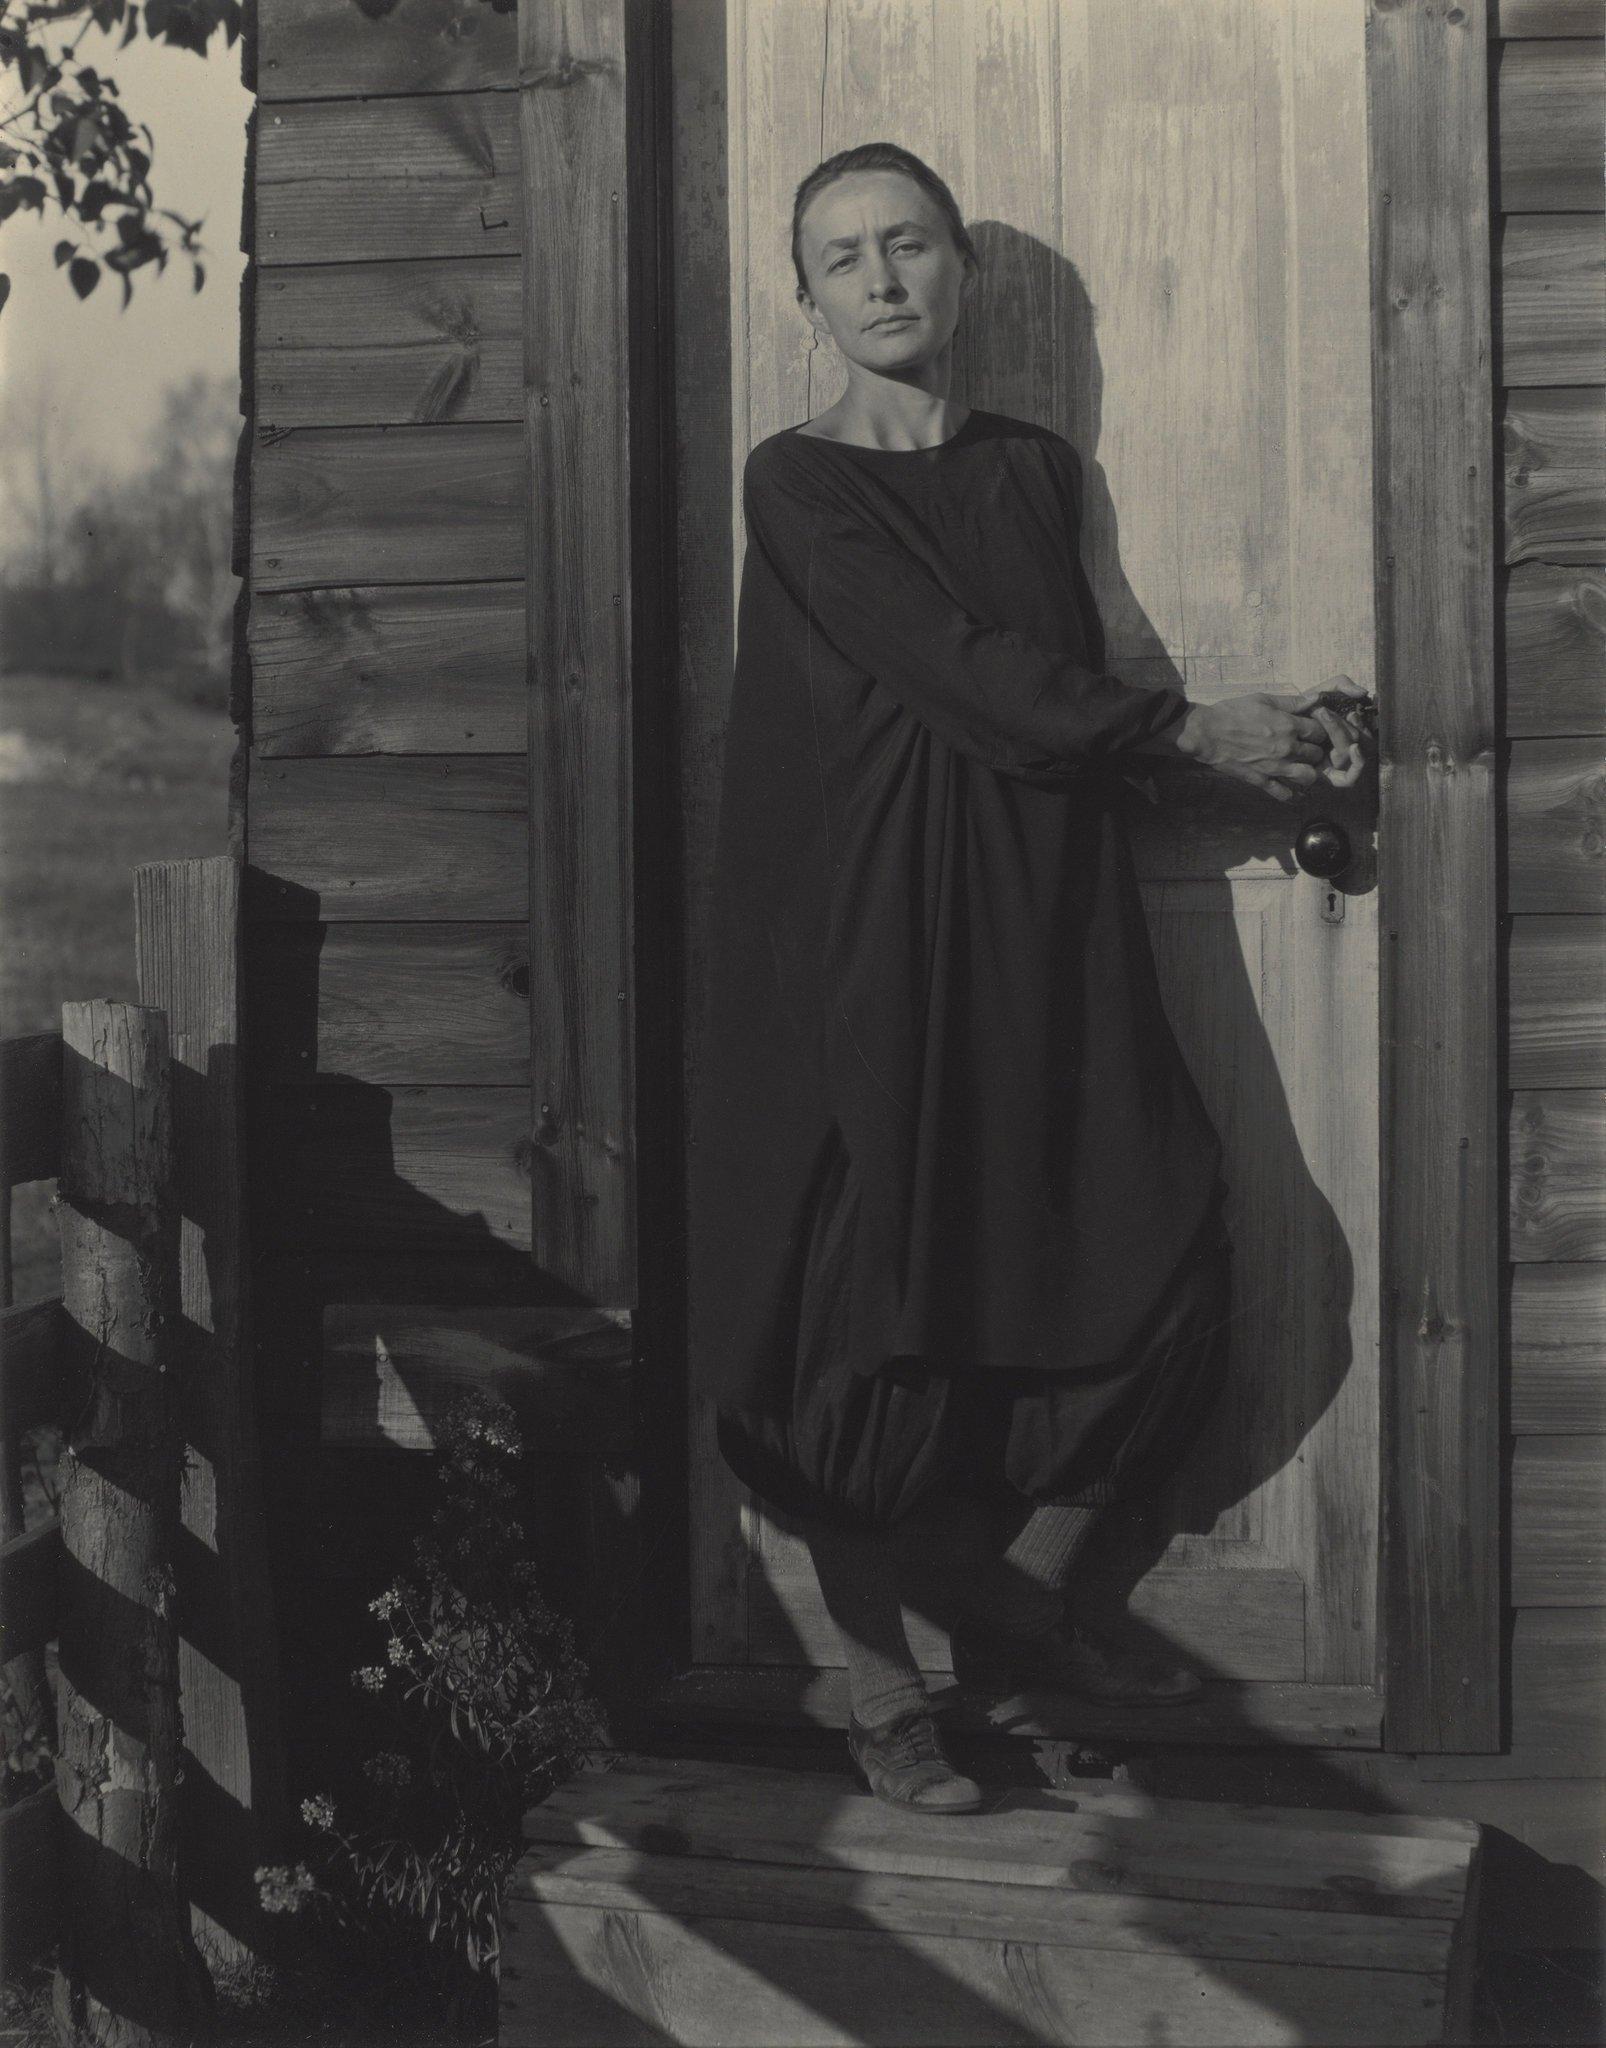 A photo of Georgia O'Keefe taken by Alfred Stieglitz in 1920.